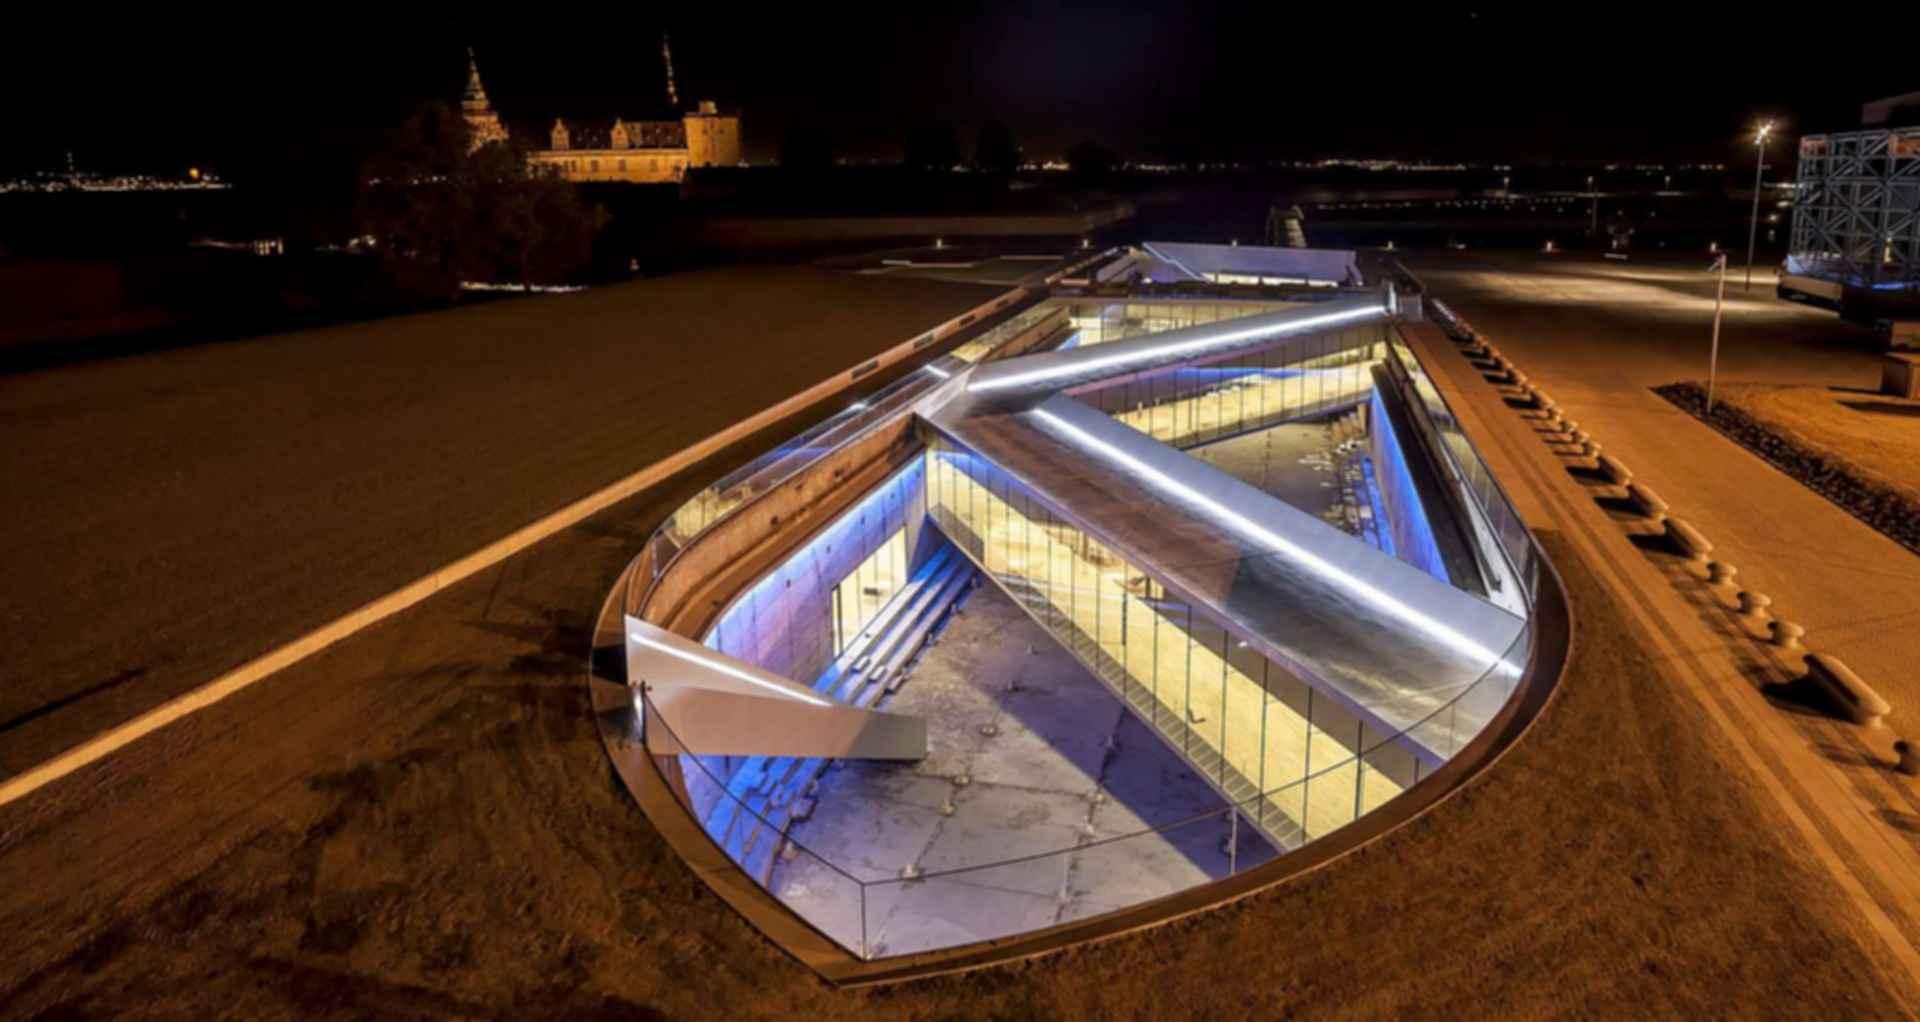 Danish National Maritime Museum - Exterior